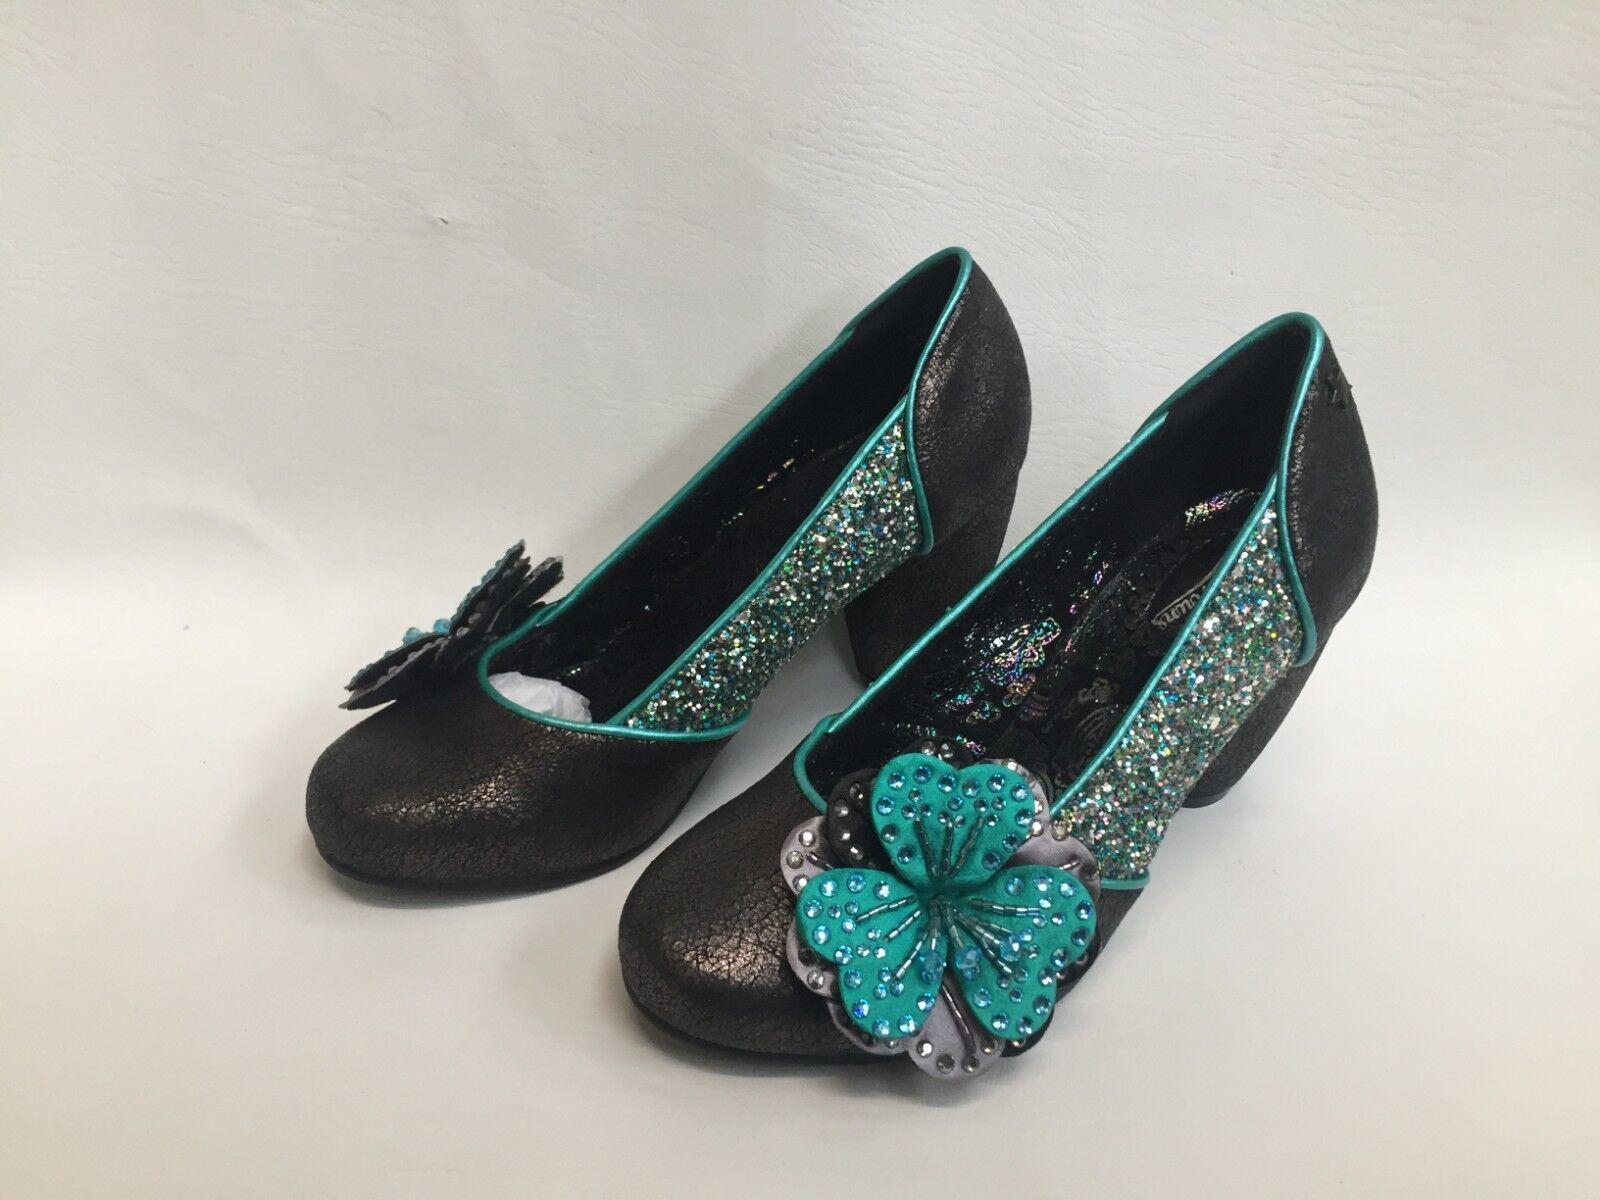 NUOVO Donna Joe Marronees Couture verde Acqua Glitter & Shimmer Floreale. TG